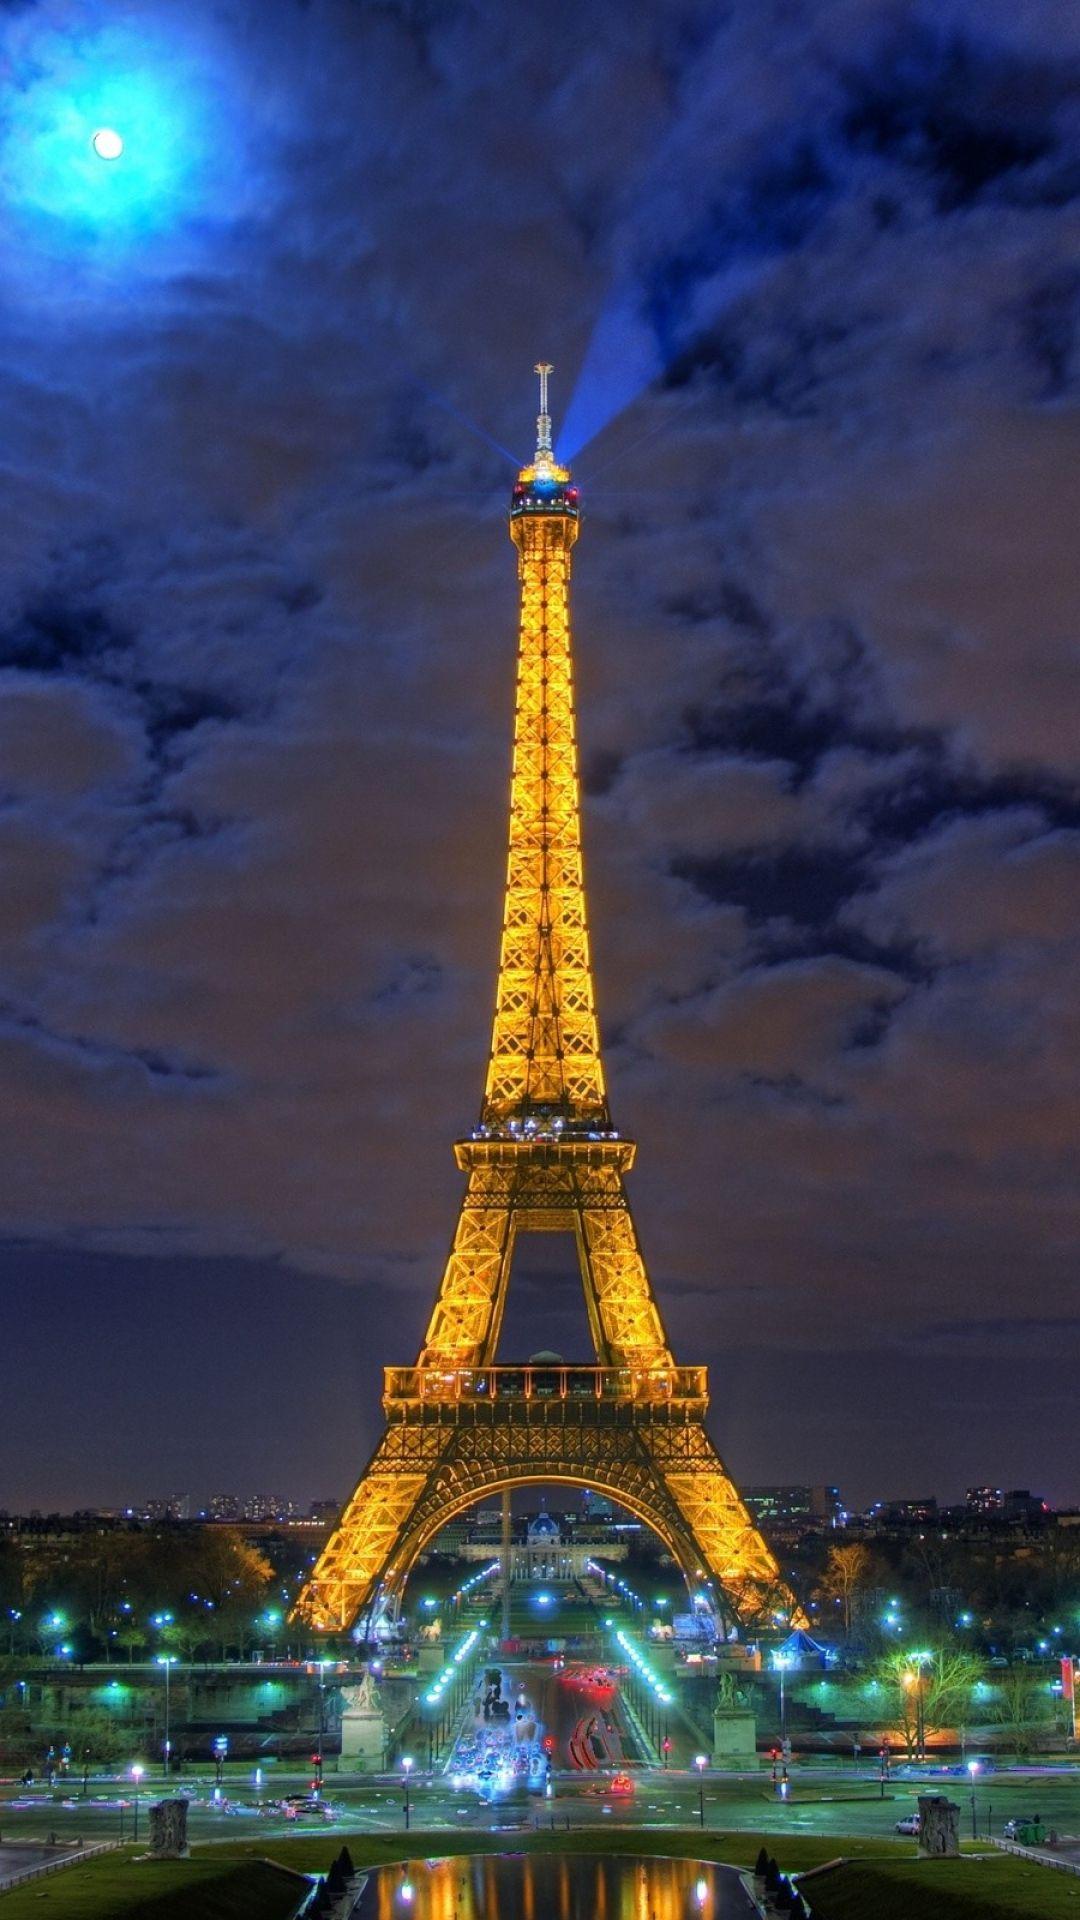 1080x1920 Wallpaper Eiffel Tower Paris France Night Hdr